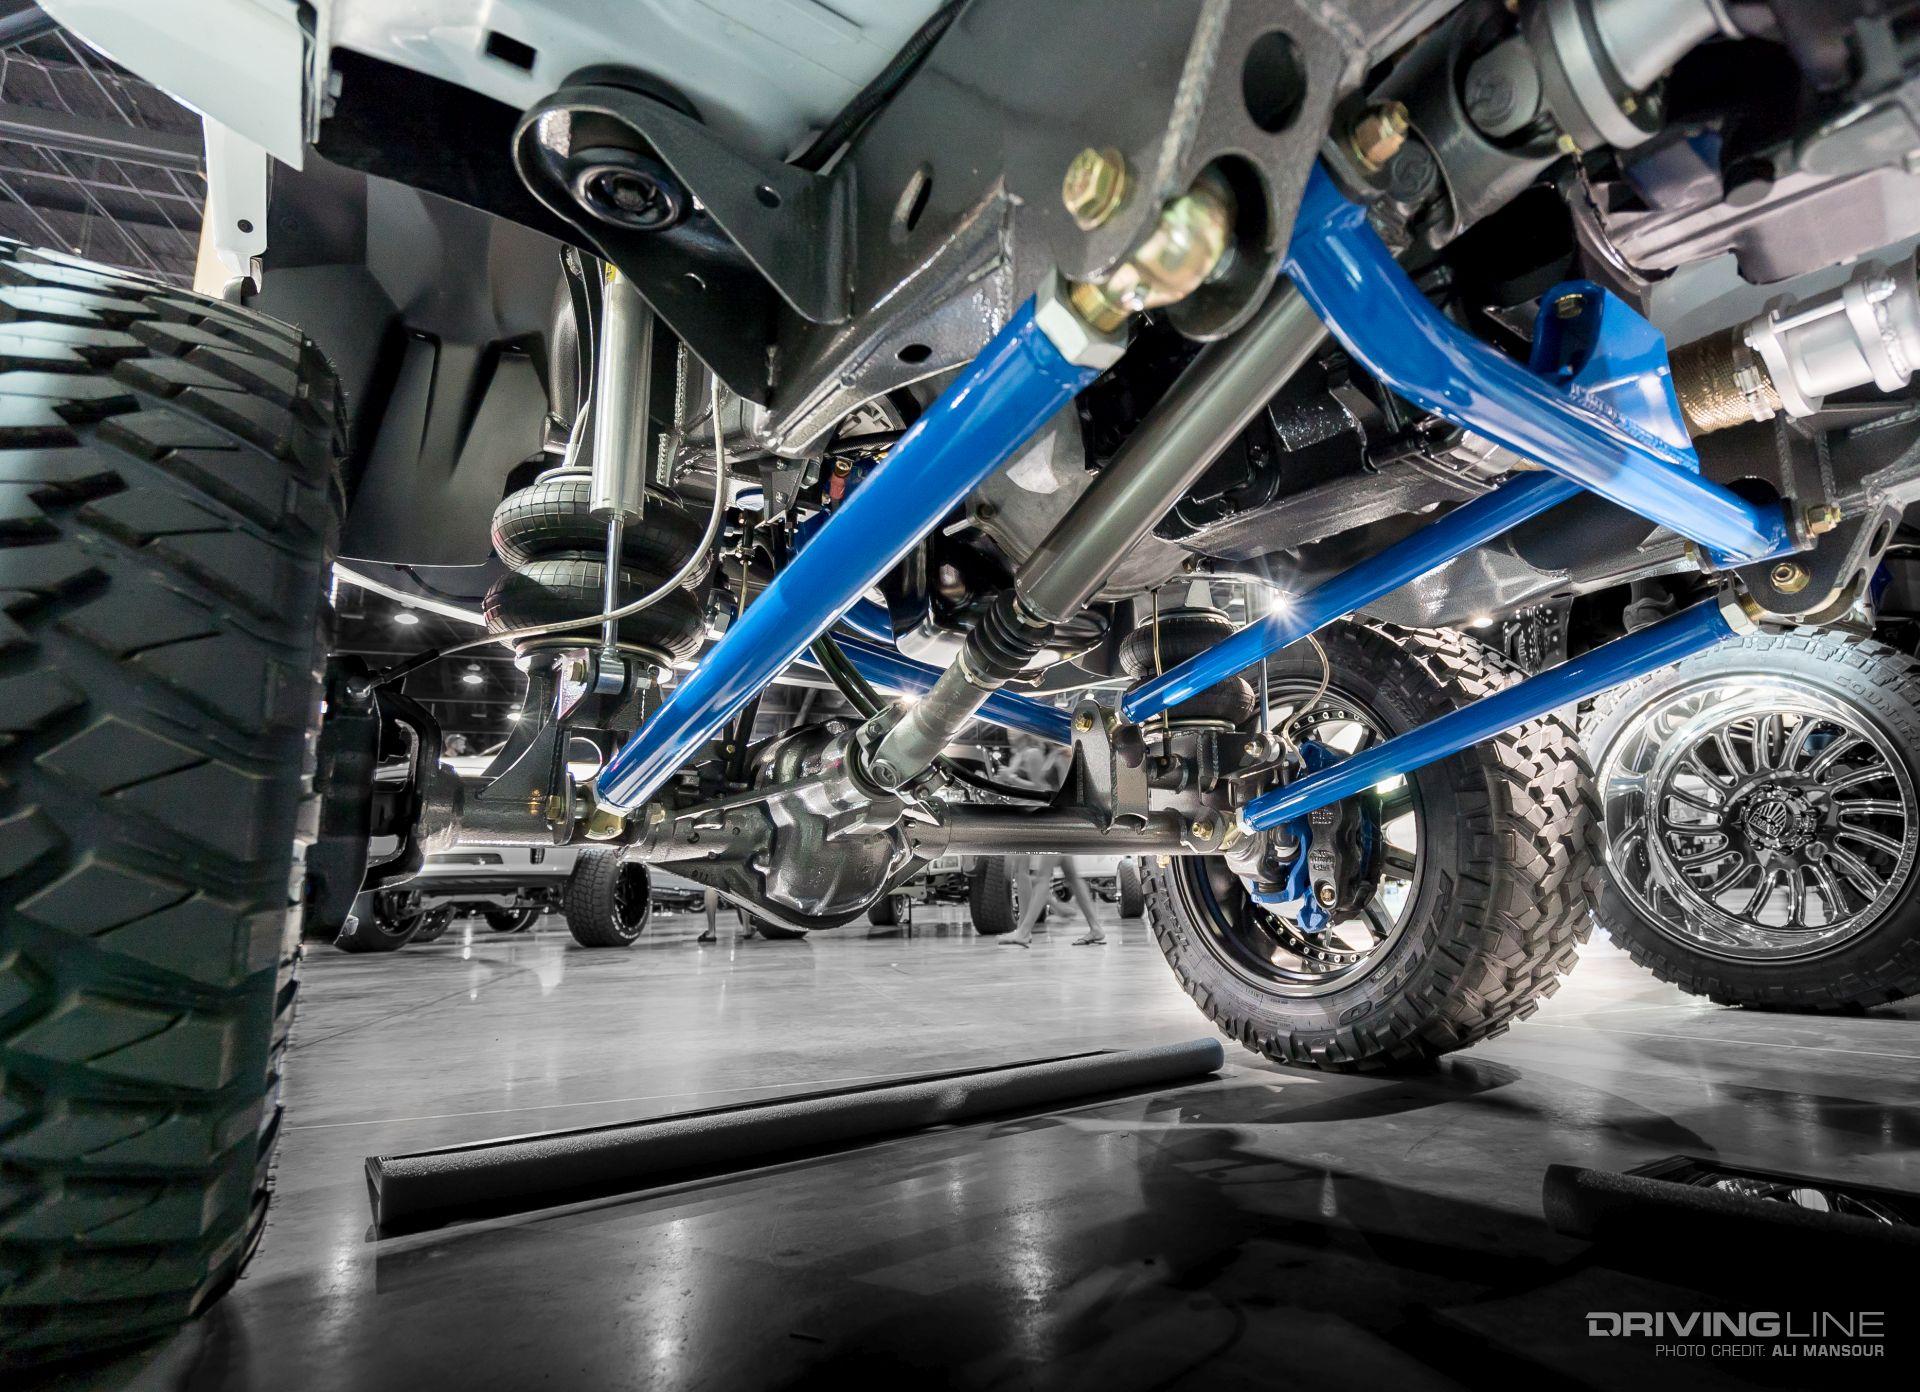 4btmins Solid Axle Swap The Dodge Dakota Of Your Dreams Drivingline